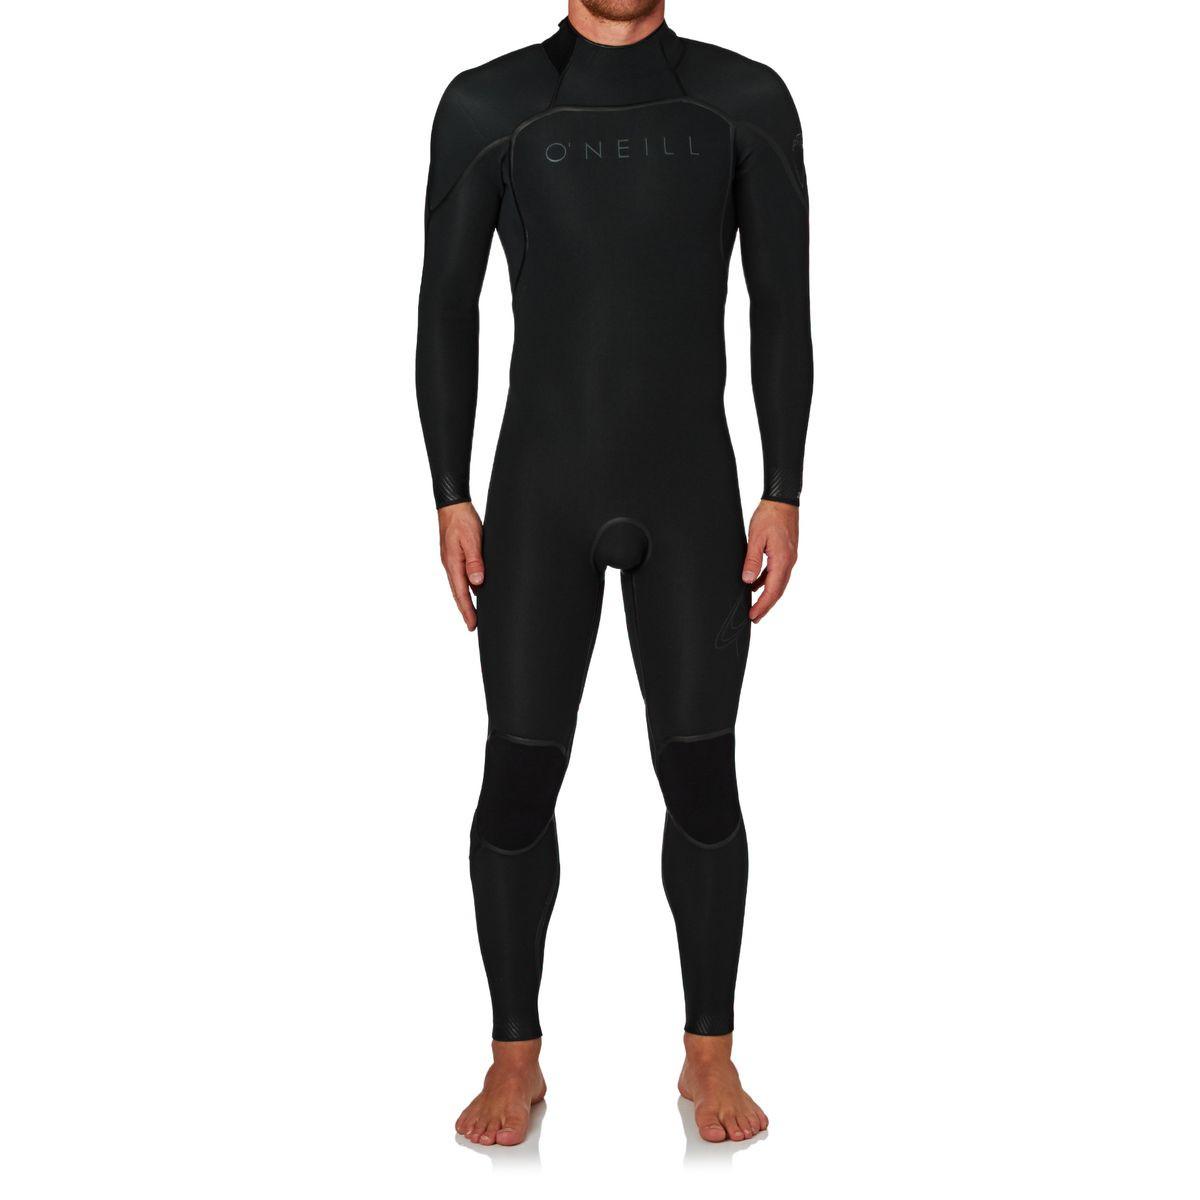 O'Neill Psycho One 3/2mm 2017 Back Zip Wetsuit - Black/ Black/ Graphite